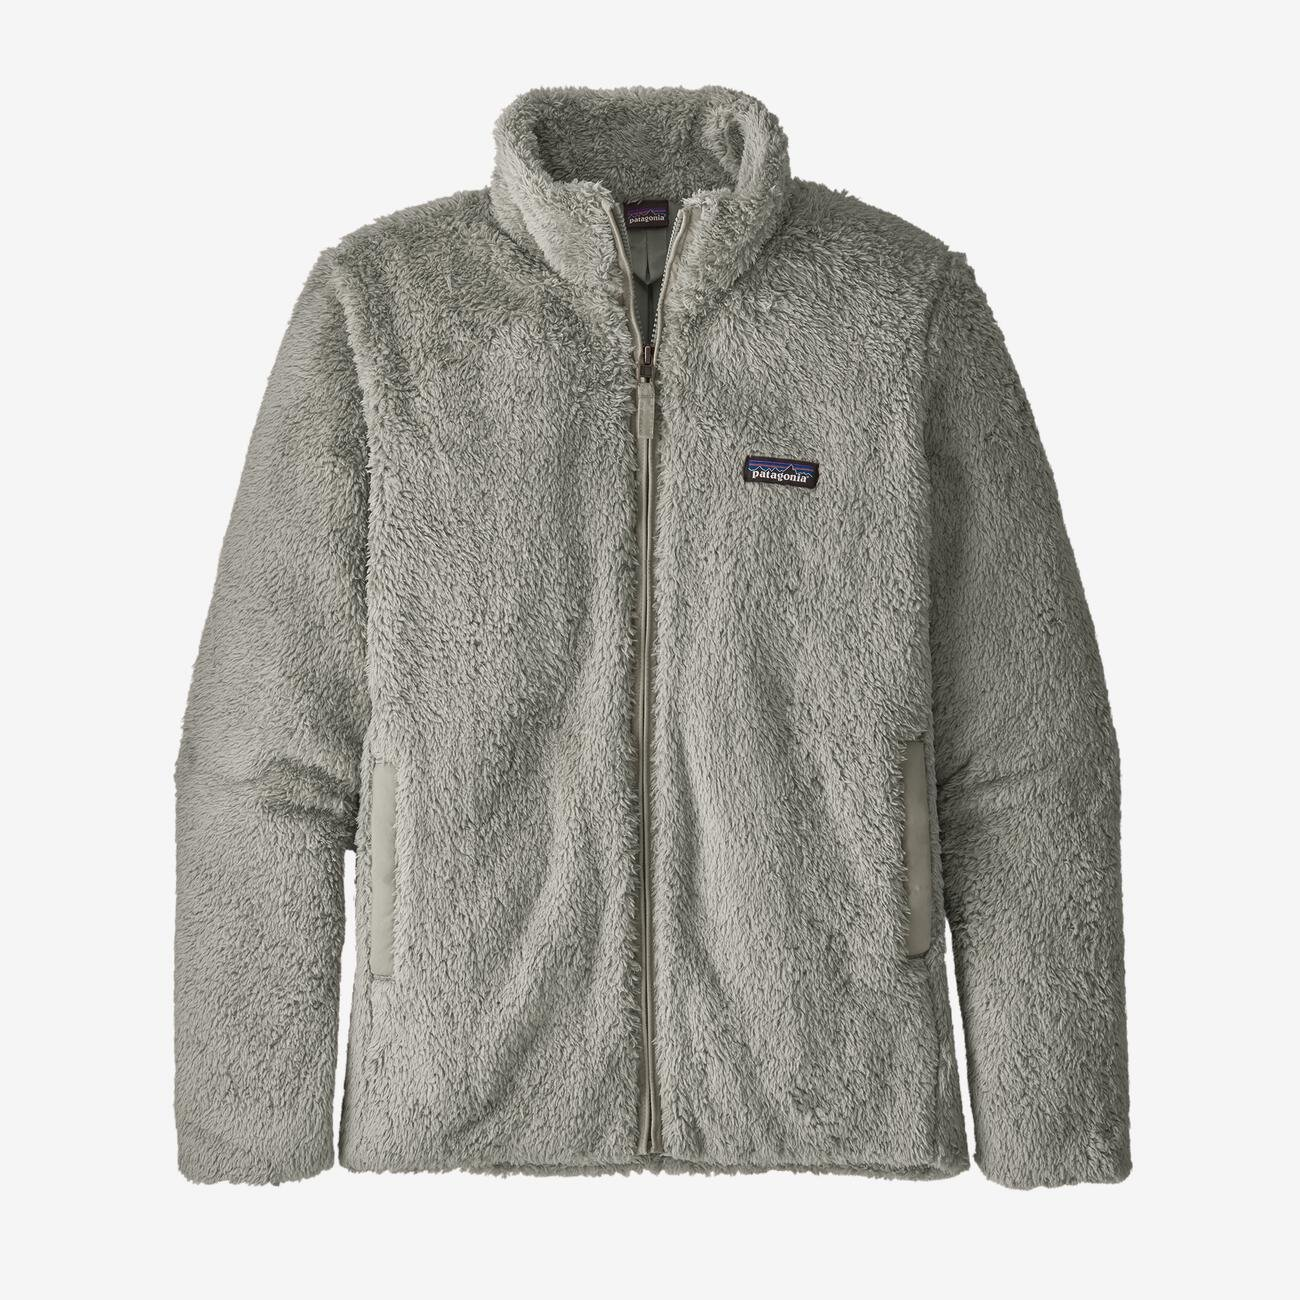 W's Patagonia Los Gatos Jacket in Salt Grey